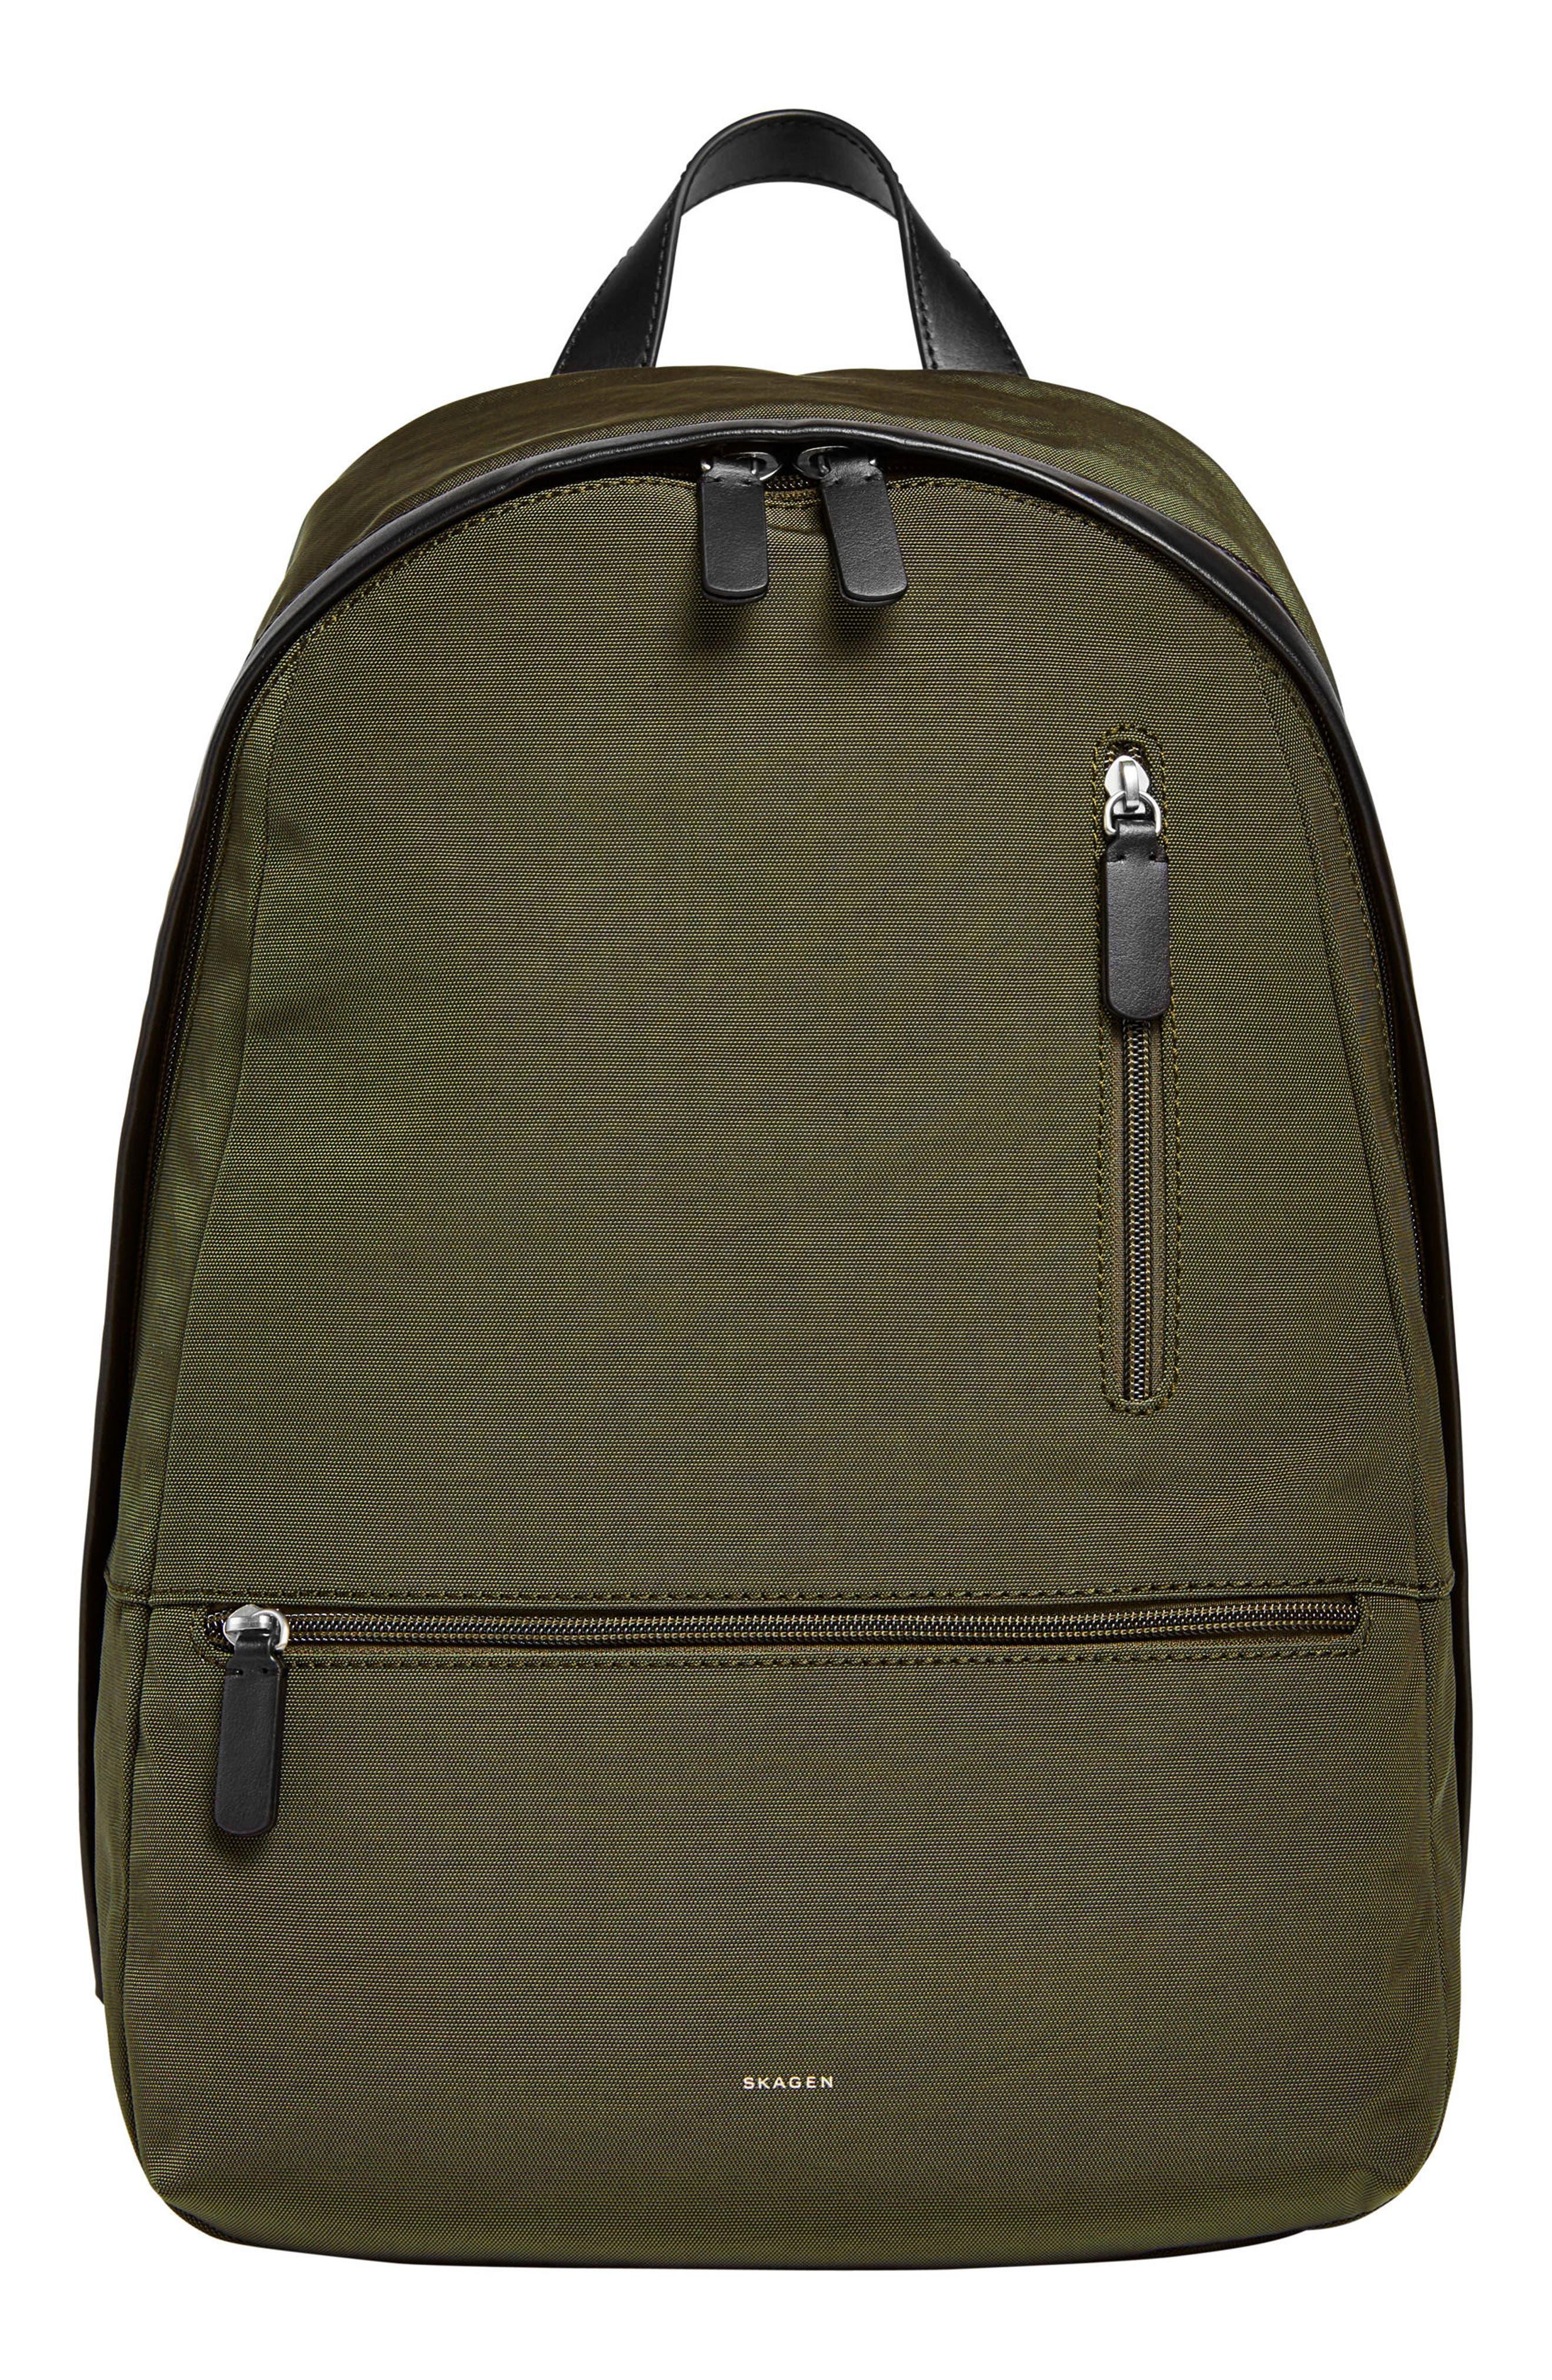 Kroyer Backpack,                             Main thumbnail 1, color,                             Dark Green